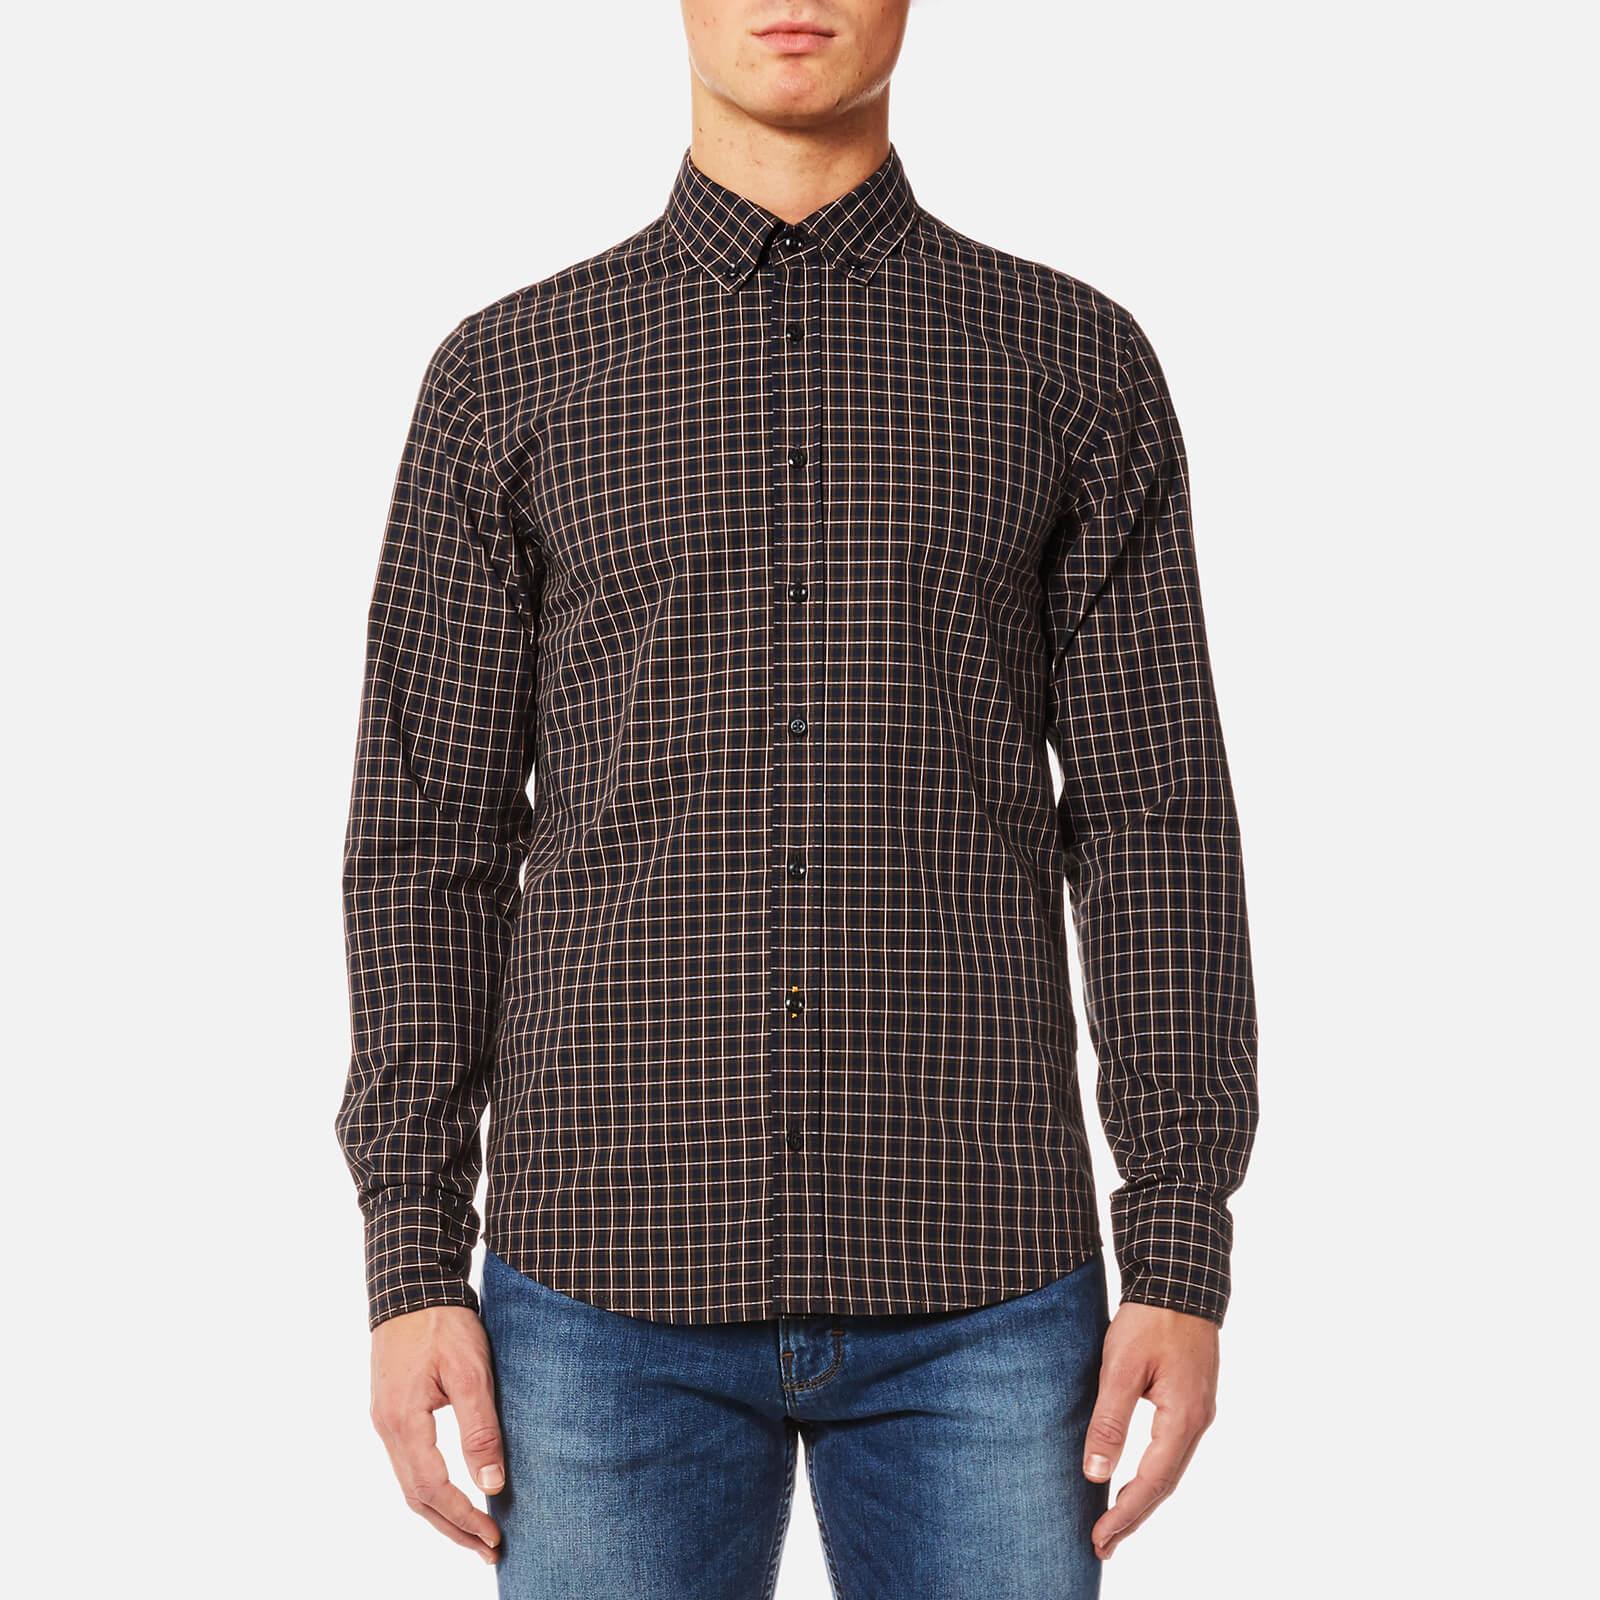 BOSS Orange Men's Epreppy Button Down Check Shirt - Open Red